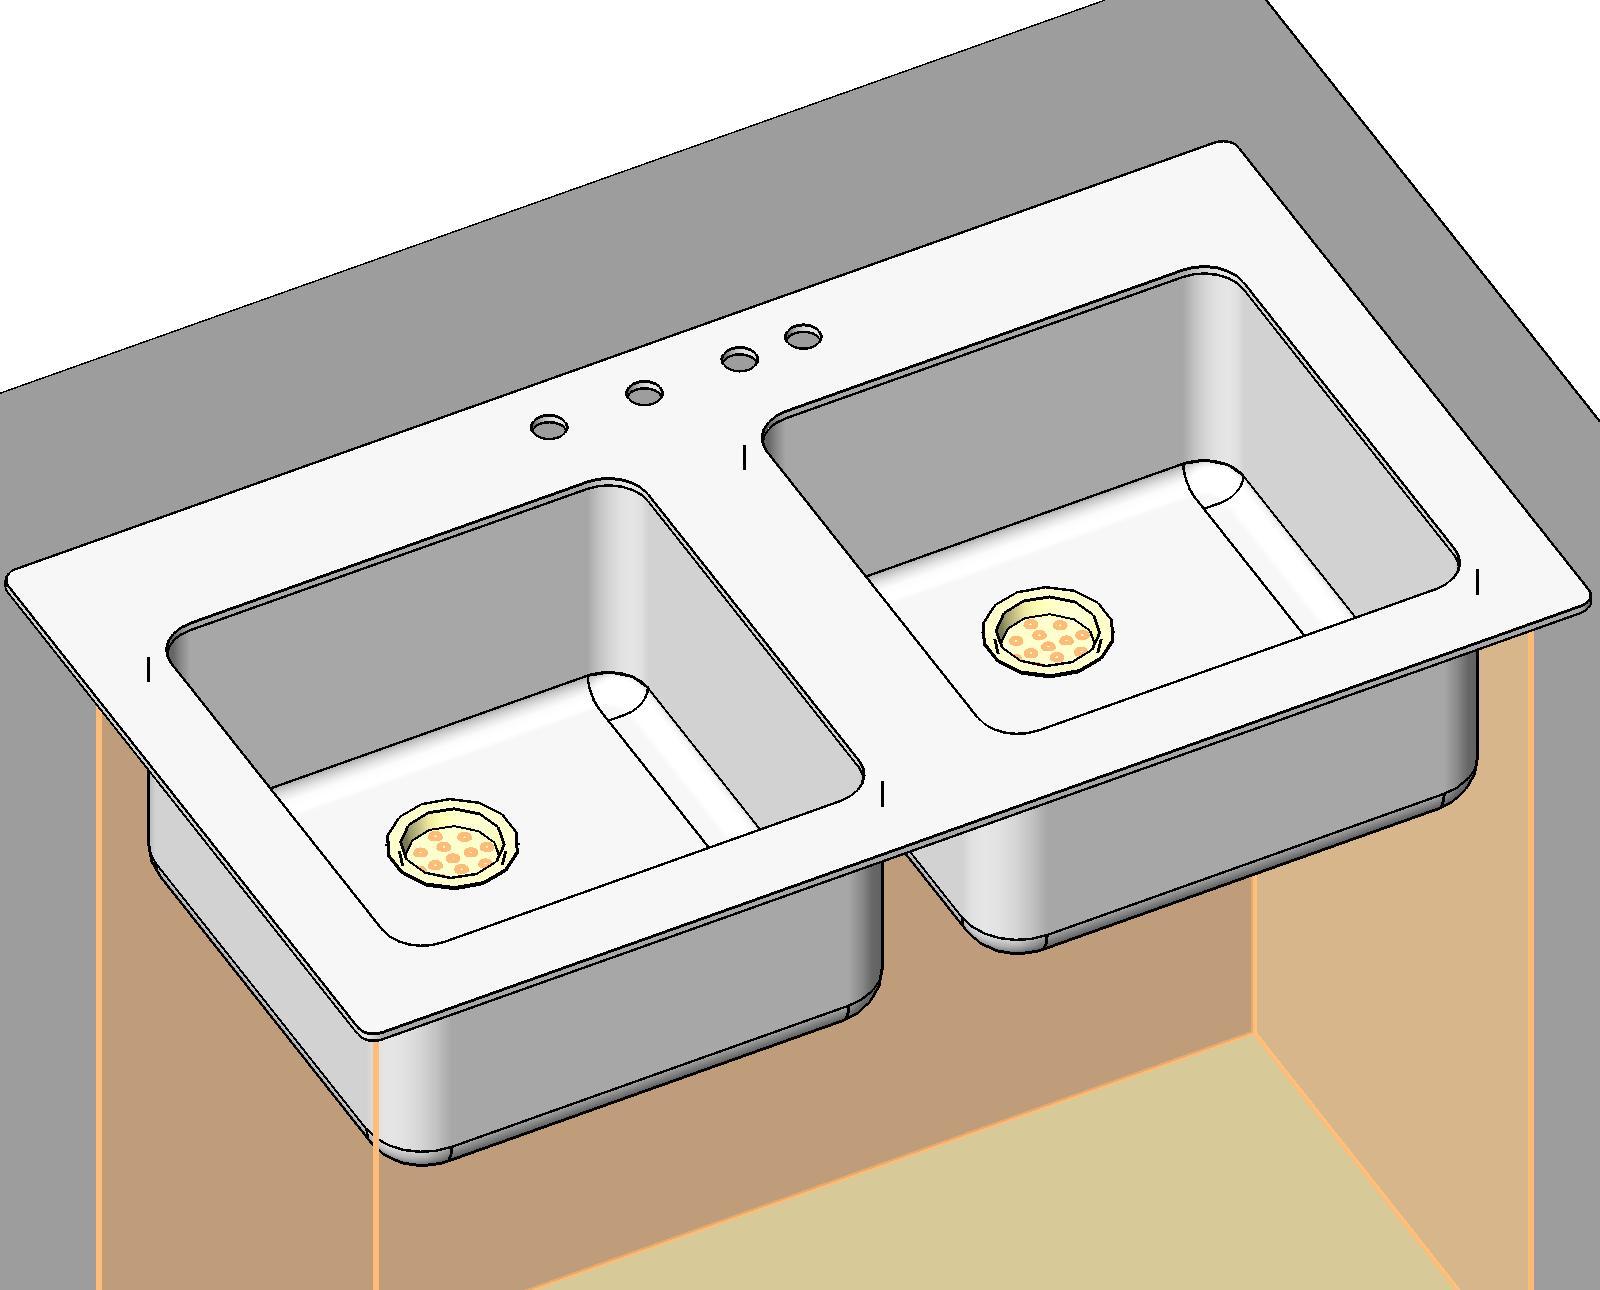 Generic Residential Plumbing Fixtures Bim Objects Families